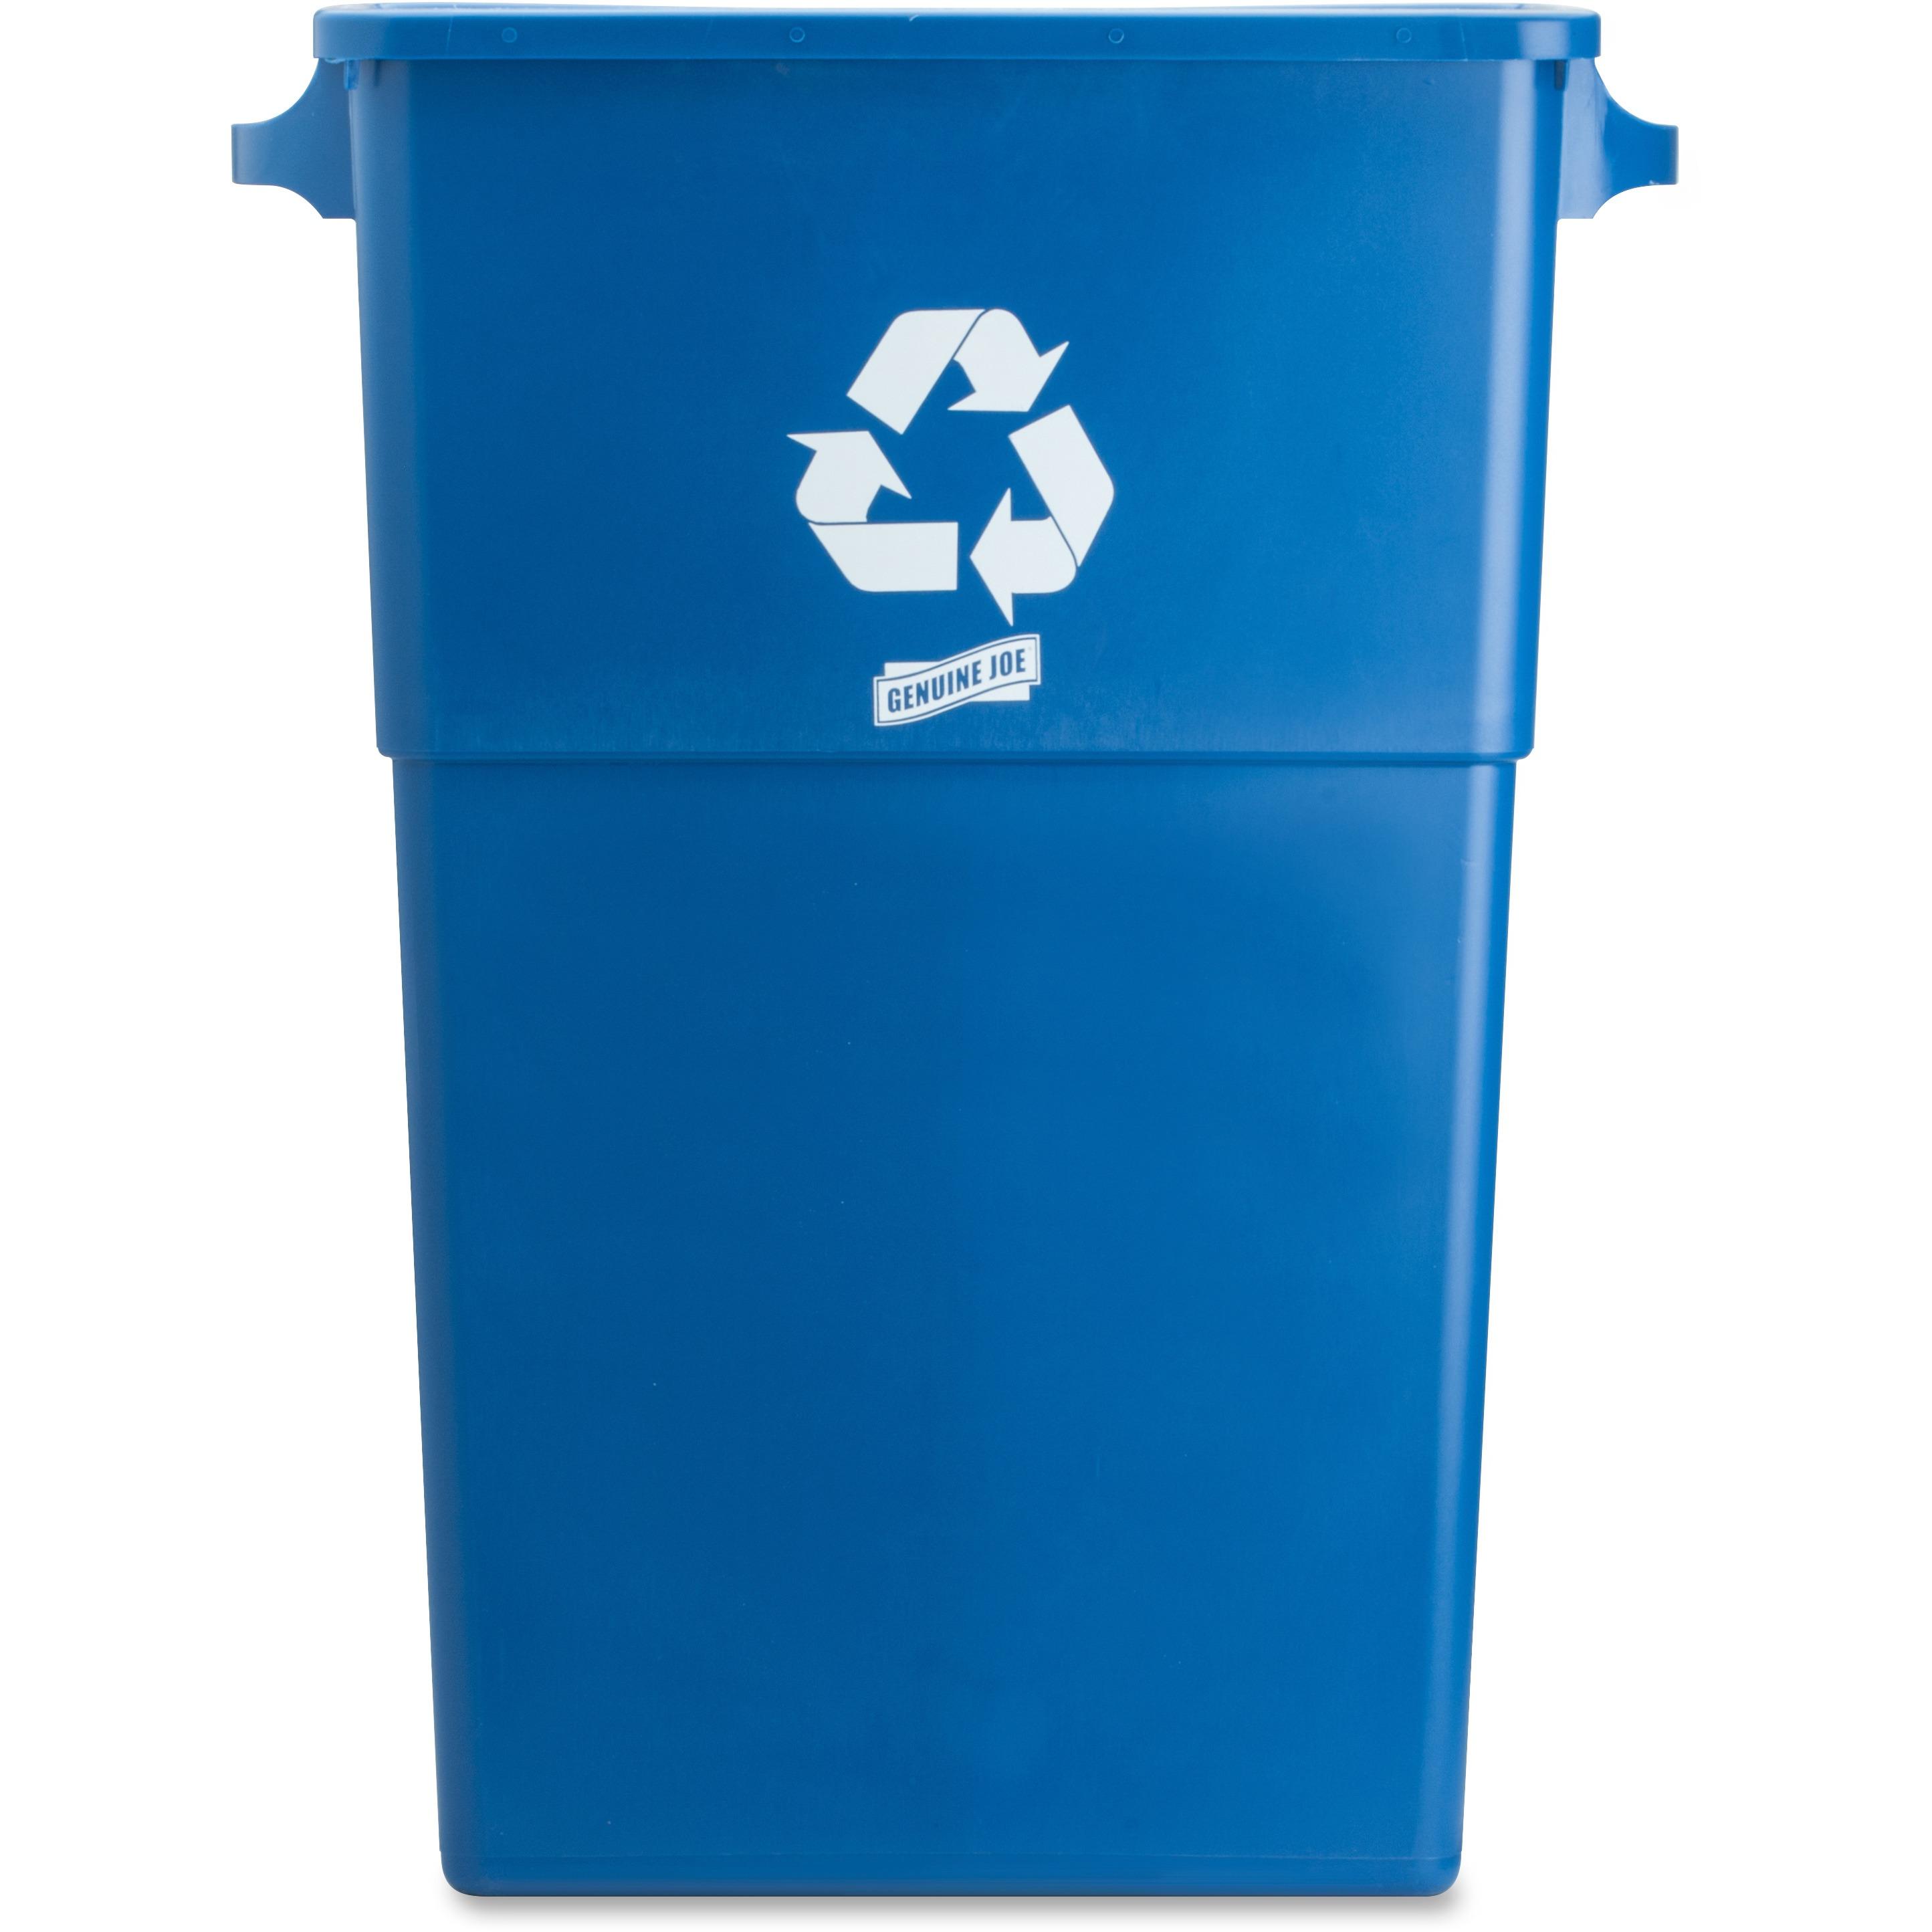 Genuine Joe 23 Gallon Recycling Bin